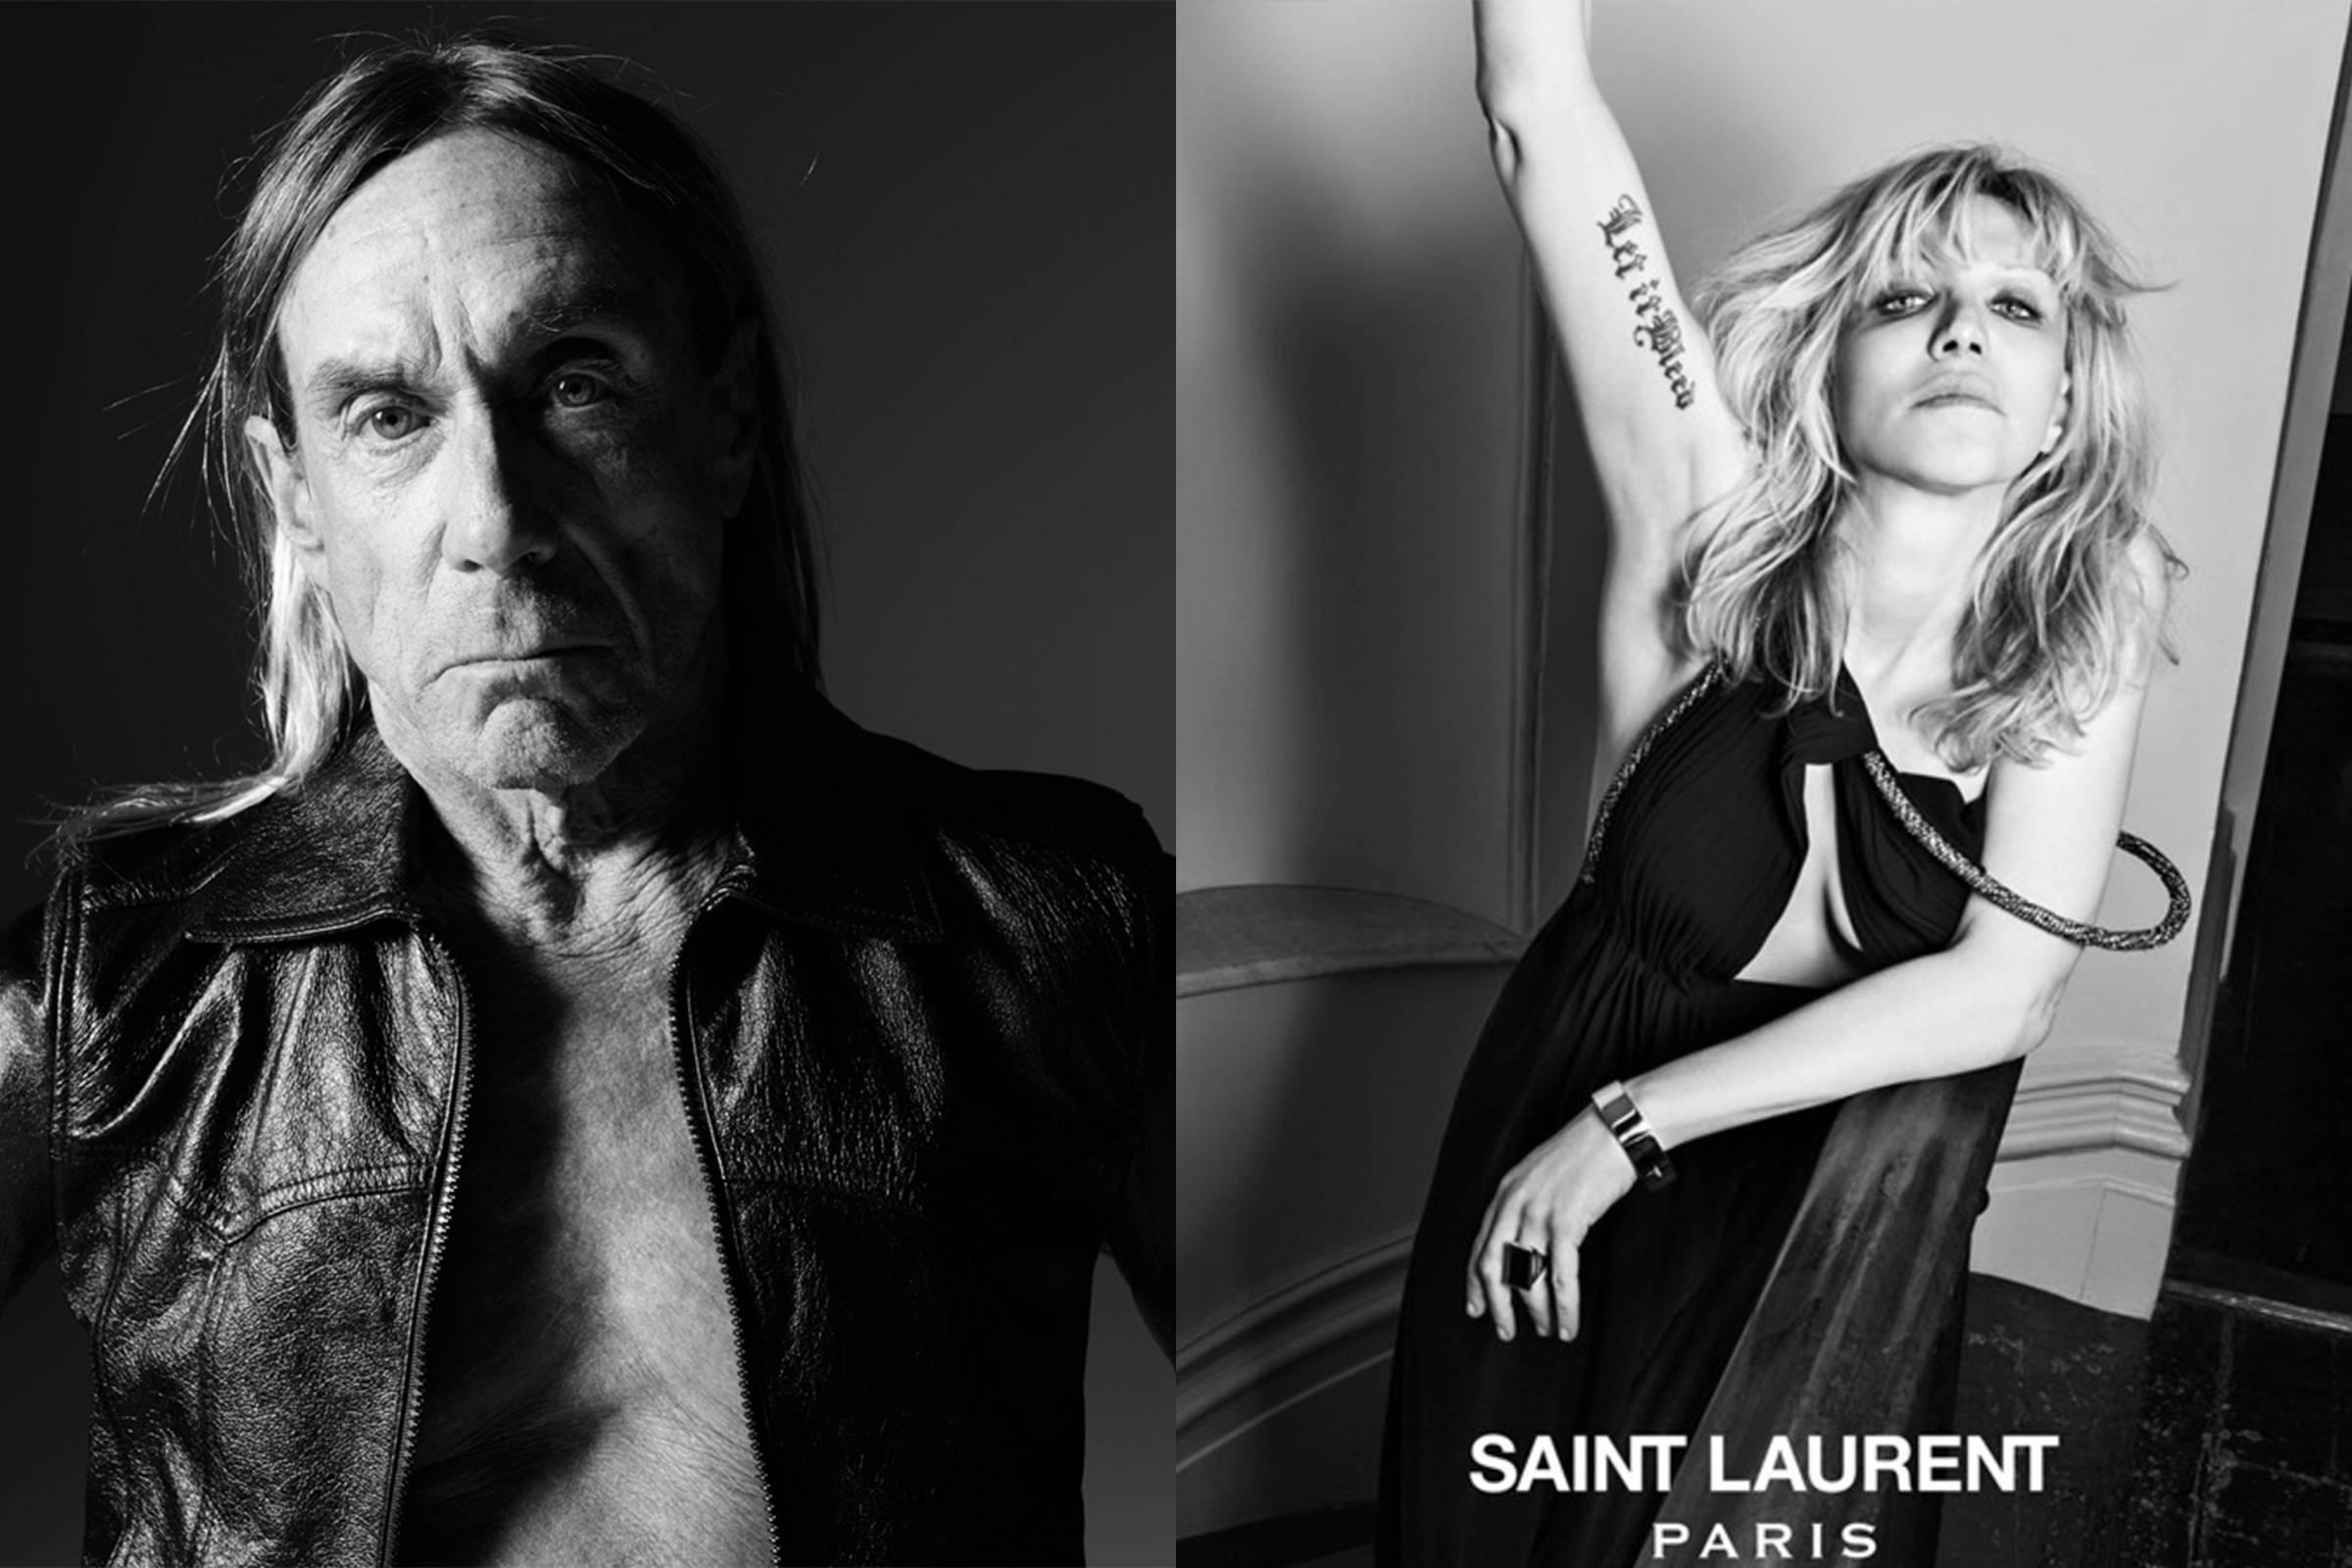 Saint Laurent Paris and Hedi Slimane